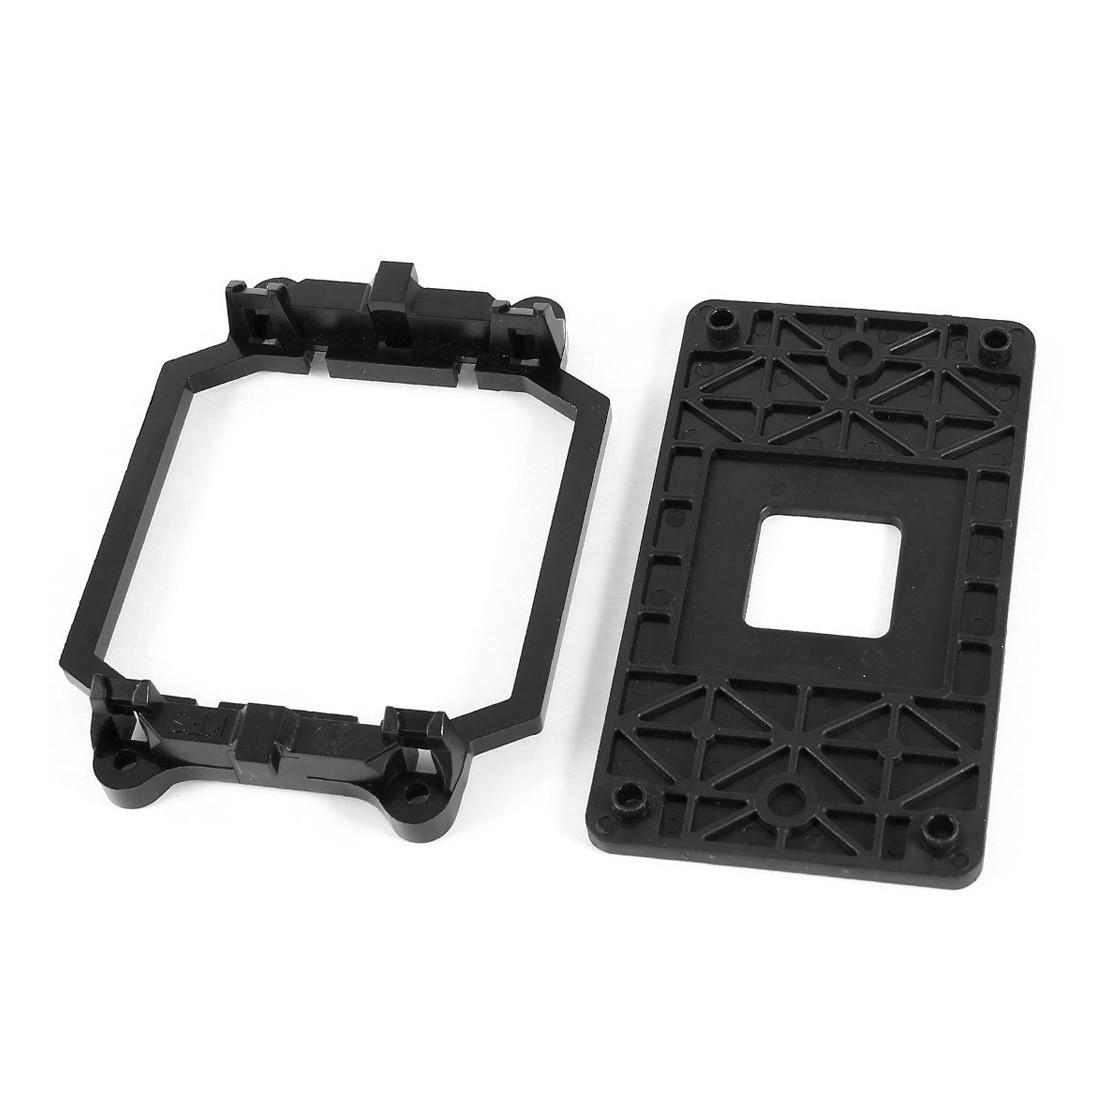 CPU Fan Base Black Plastic For AMD AM2 AM3 Socket